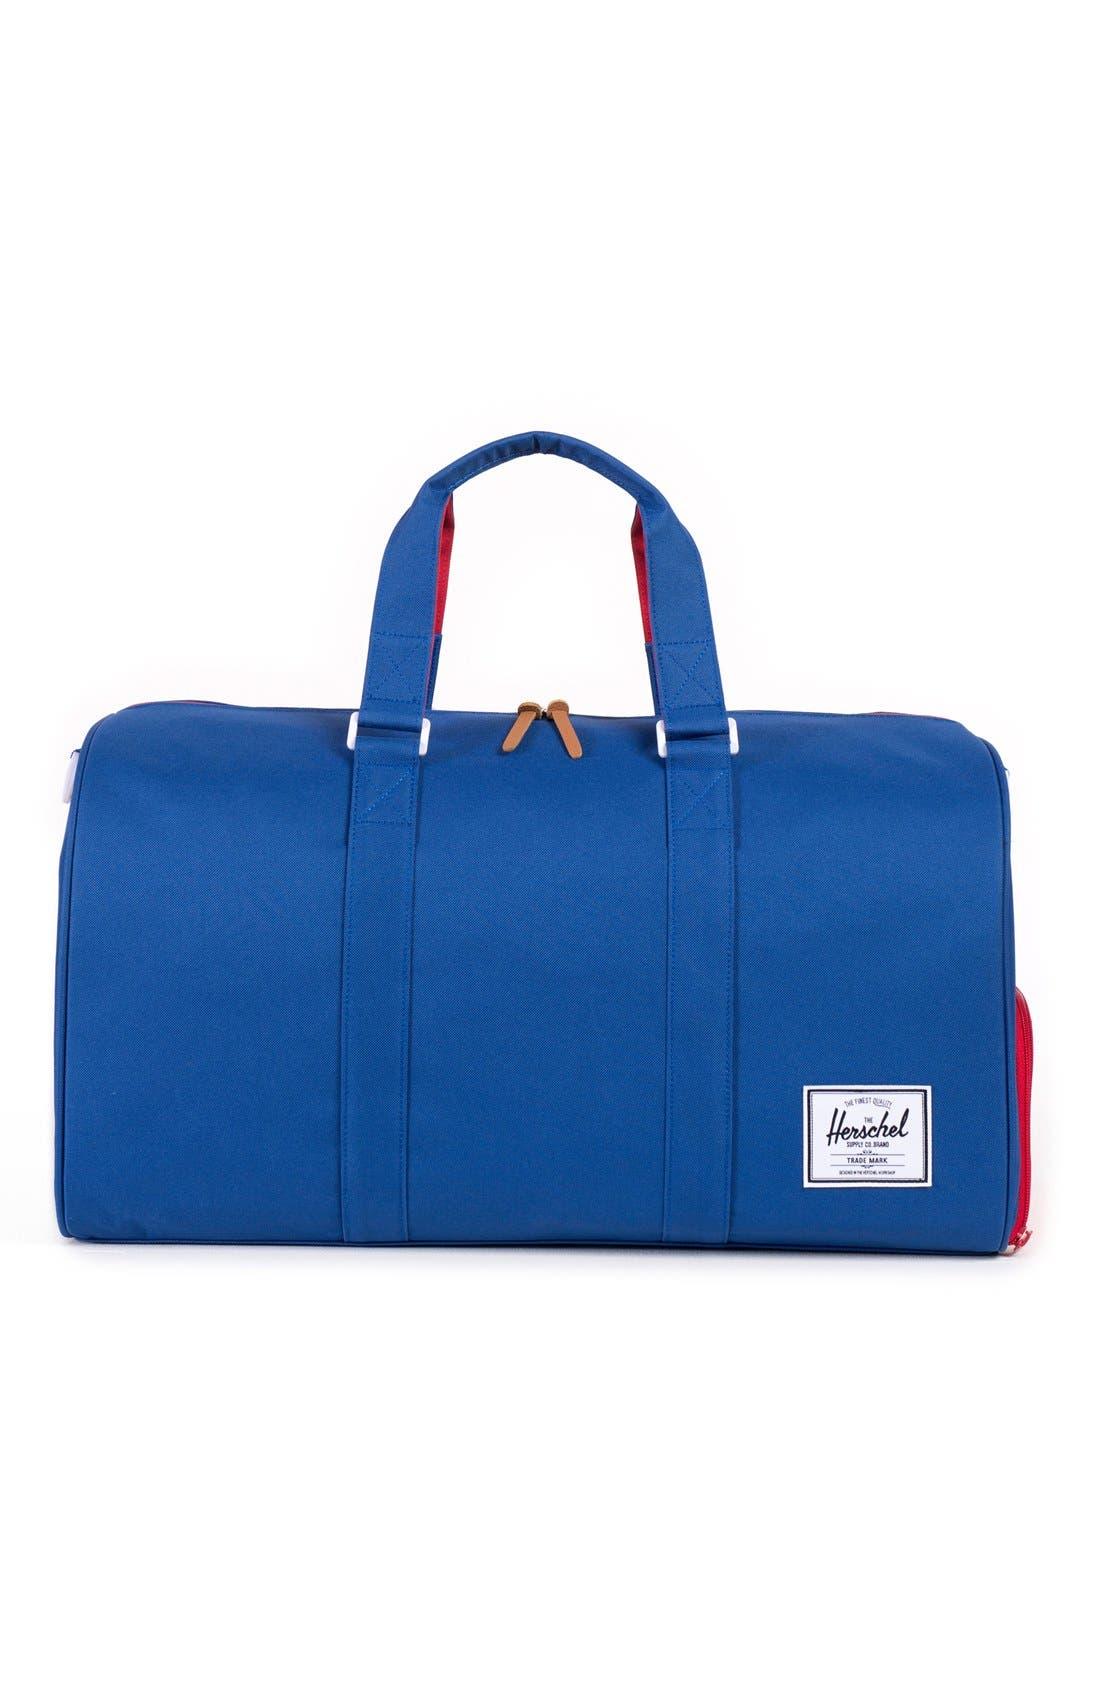 'Novel' Duffel Bag,                         Main,                         color, 472